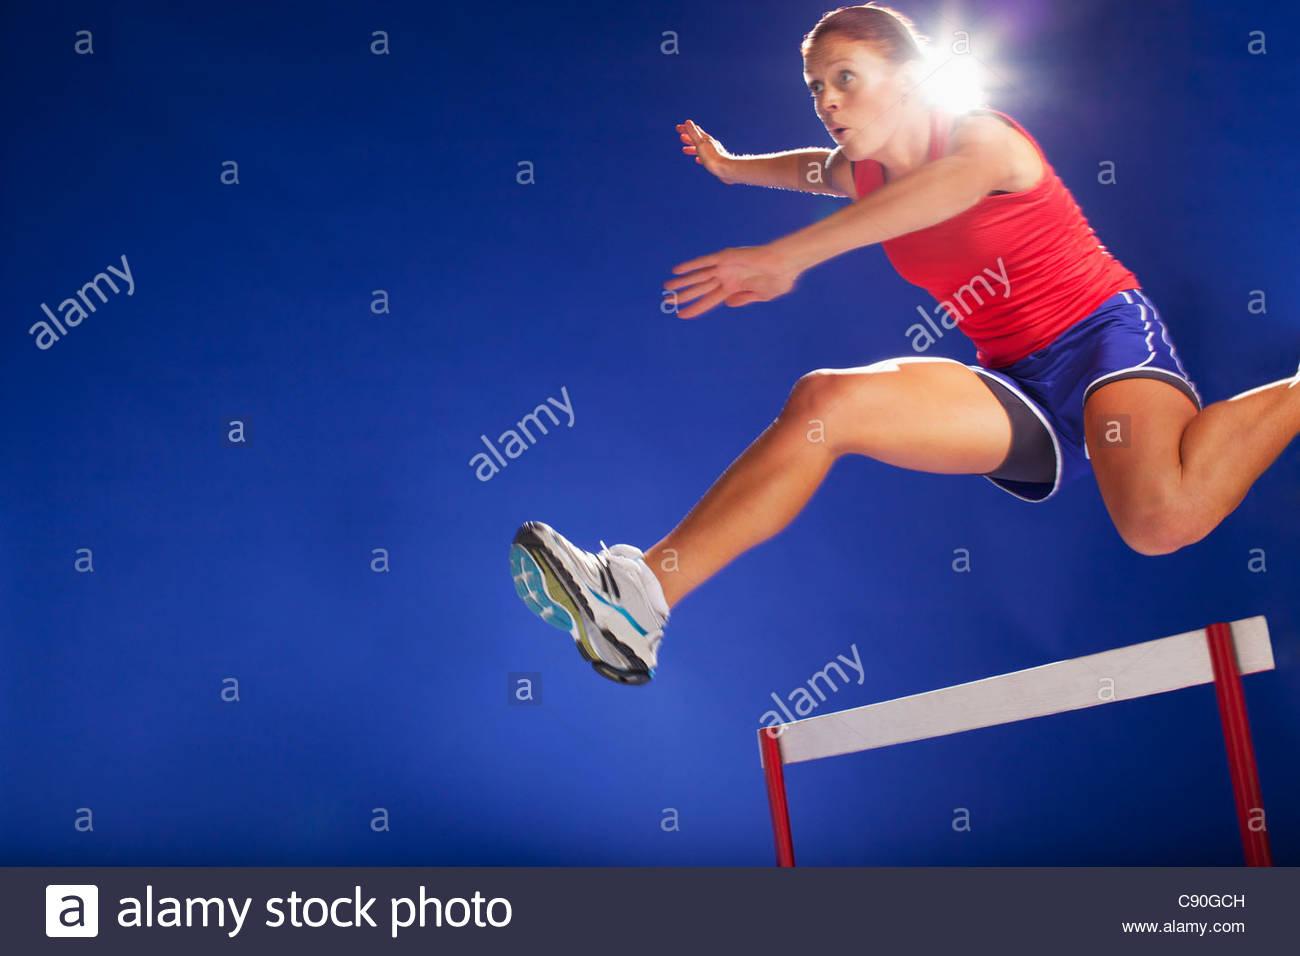 Sportler über Hürden zu springen Stockbild